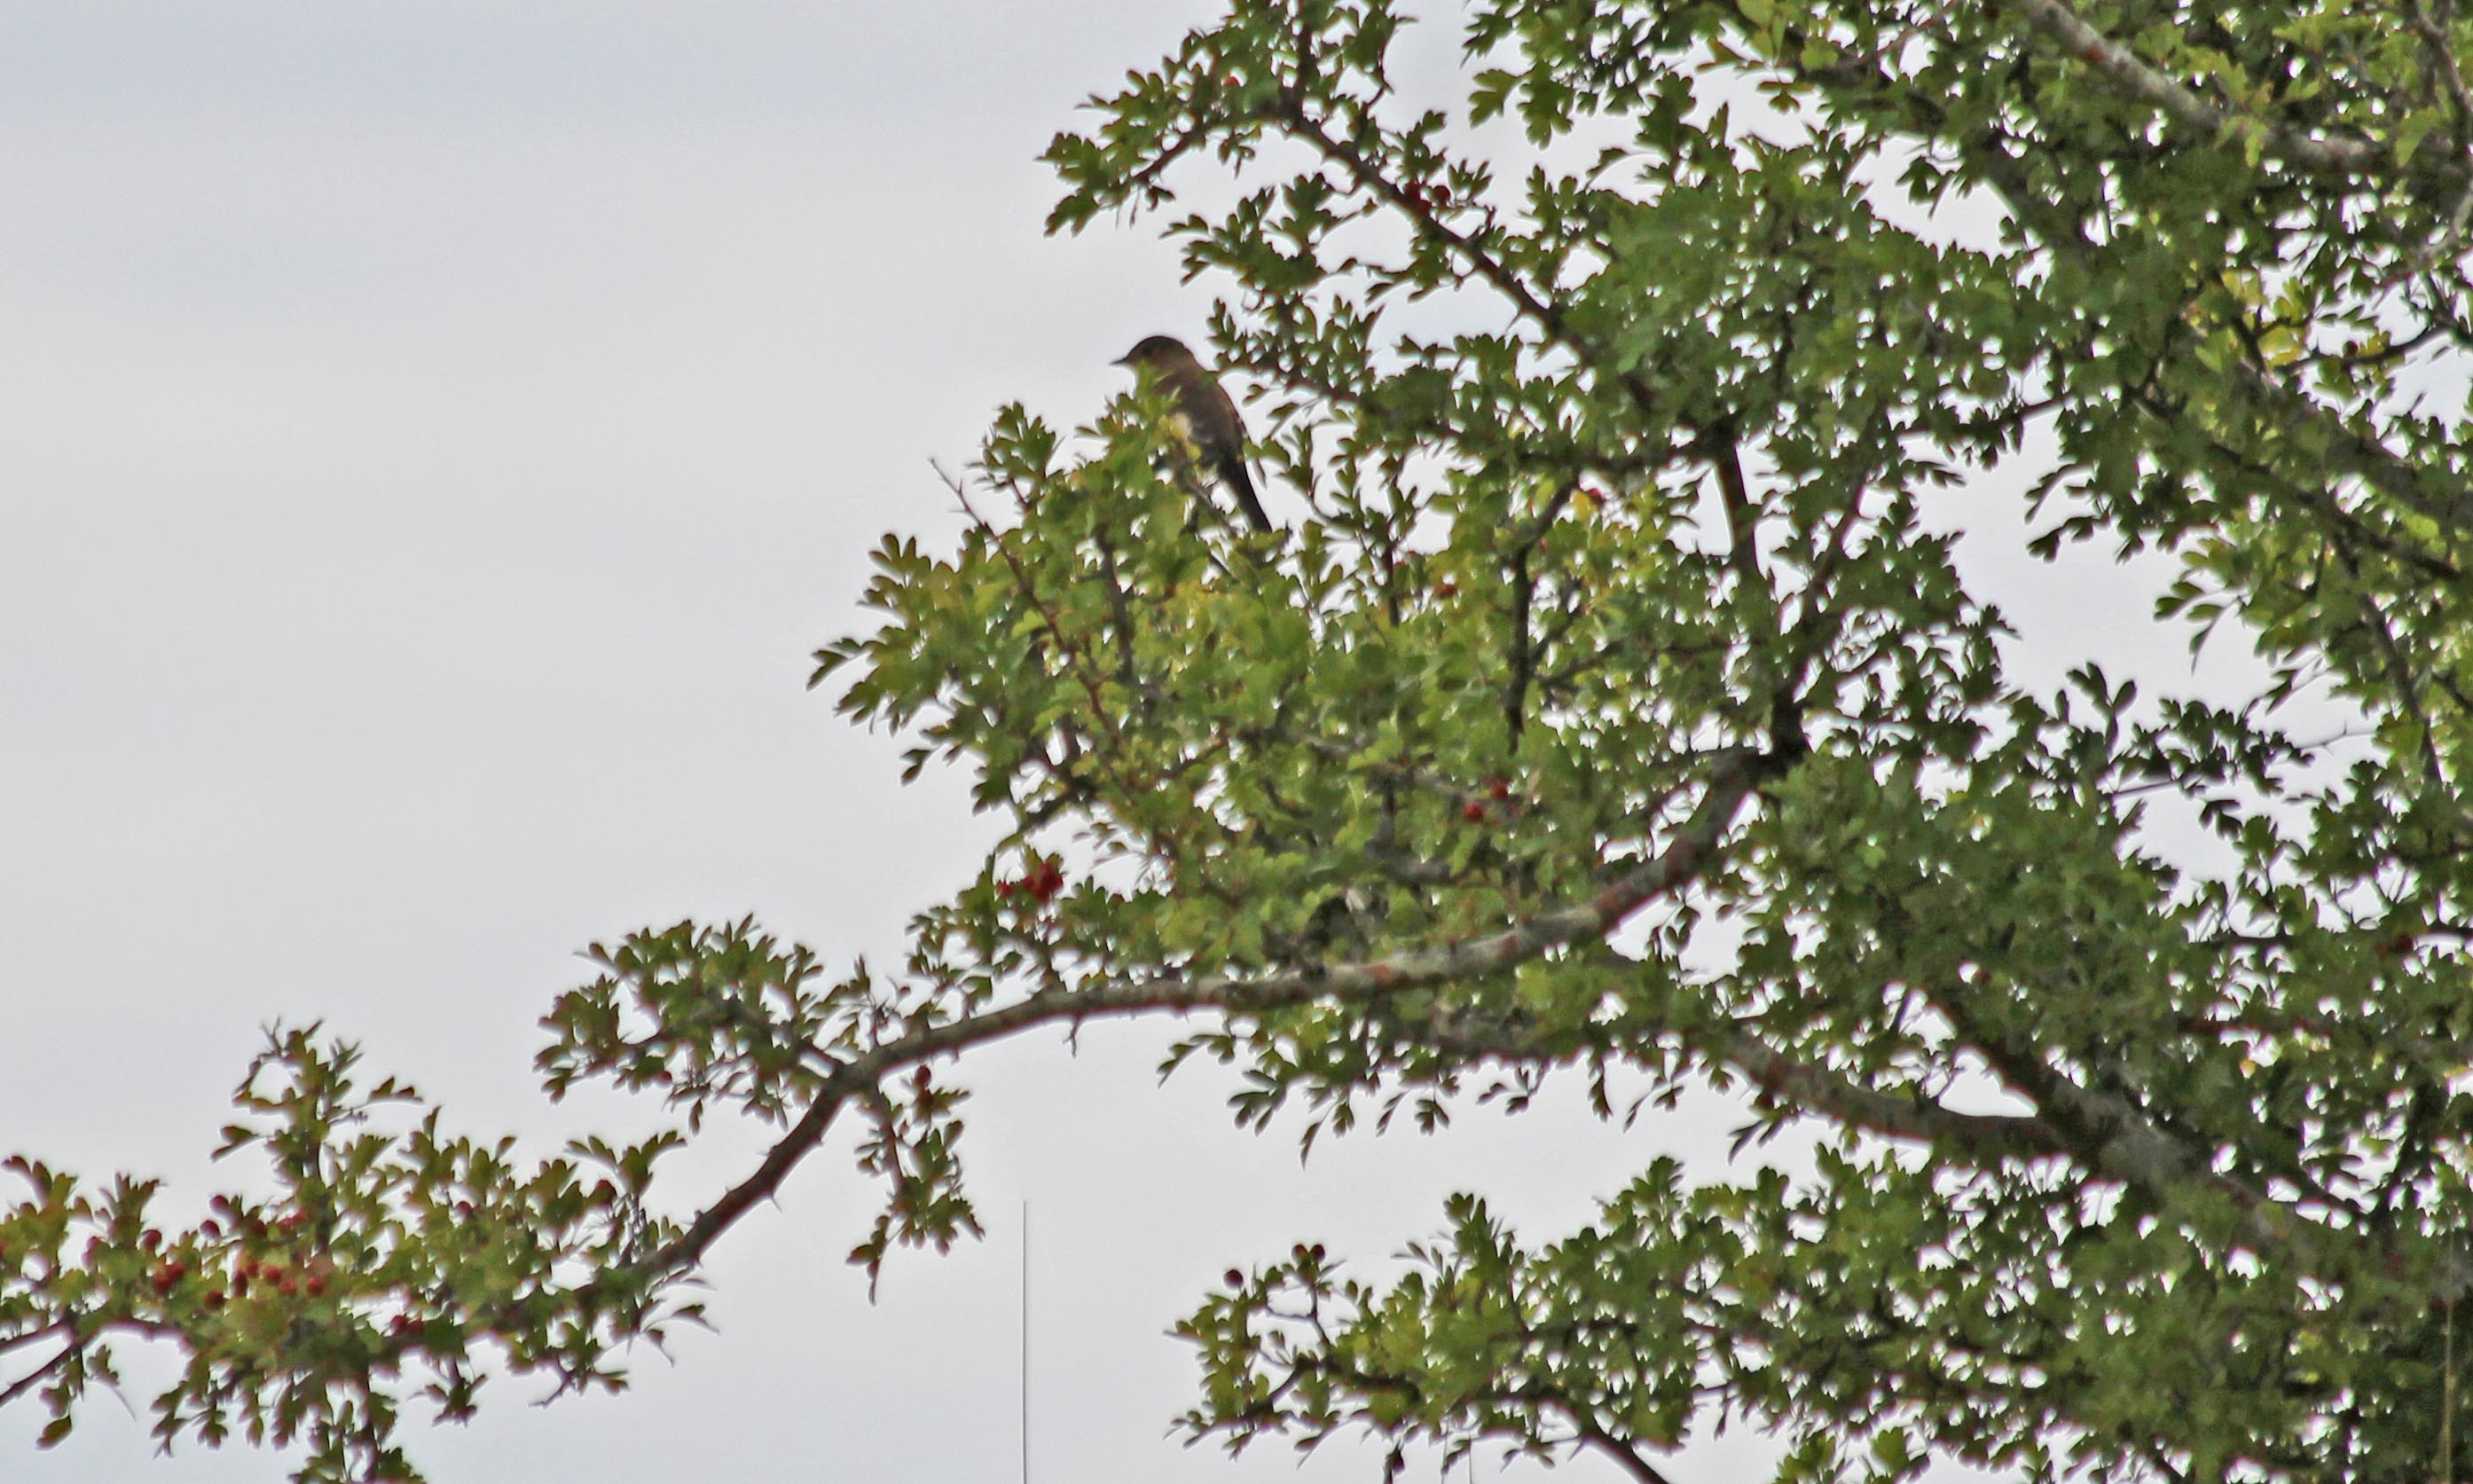 200820 pied flycatcher